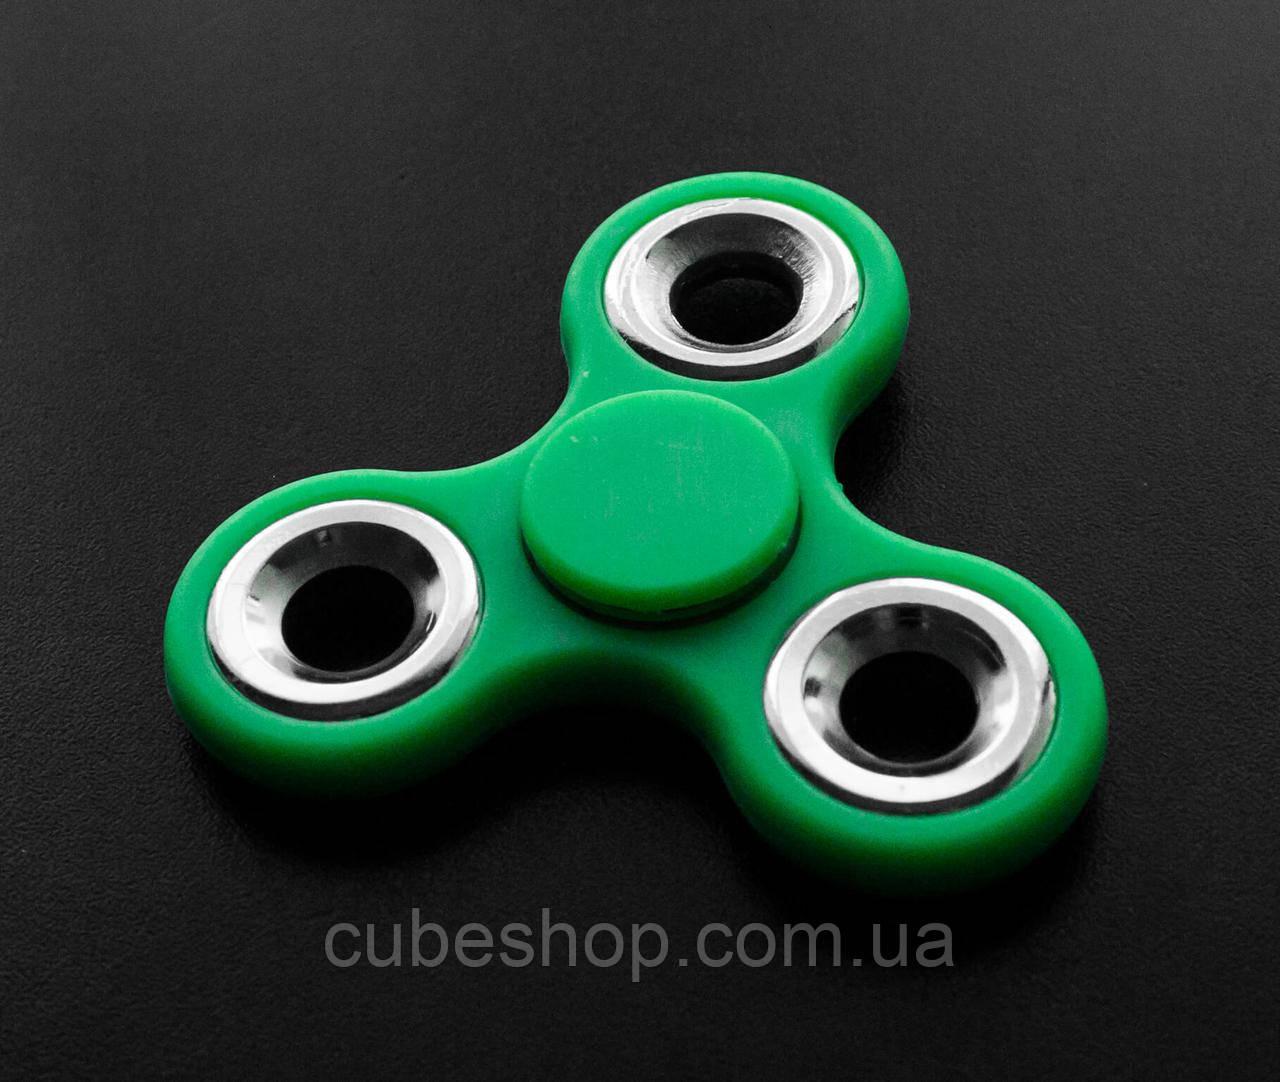 Спиннер классический Fidget Spinner зеленый